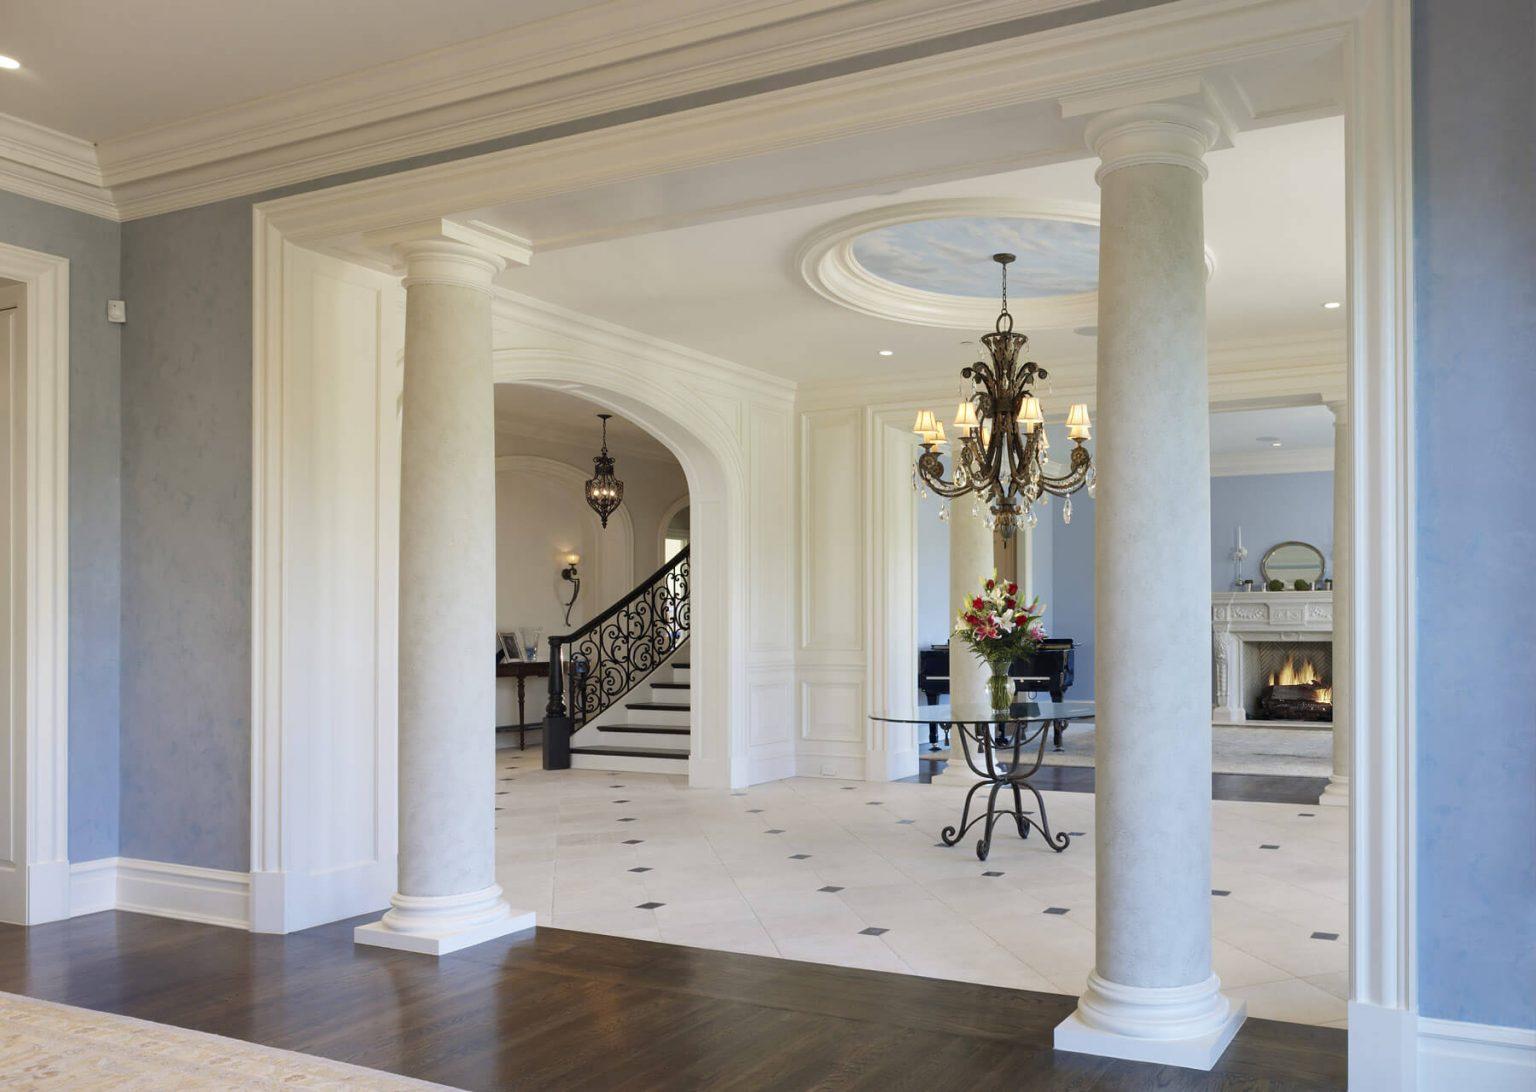 custom entryway with columns